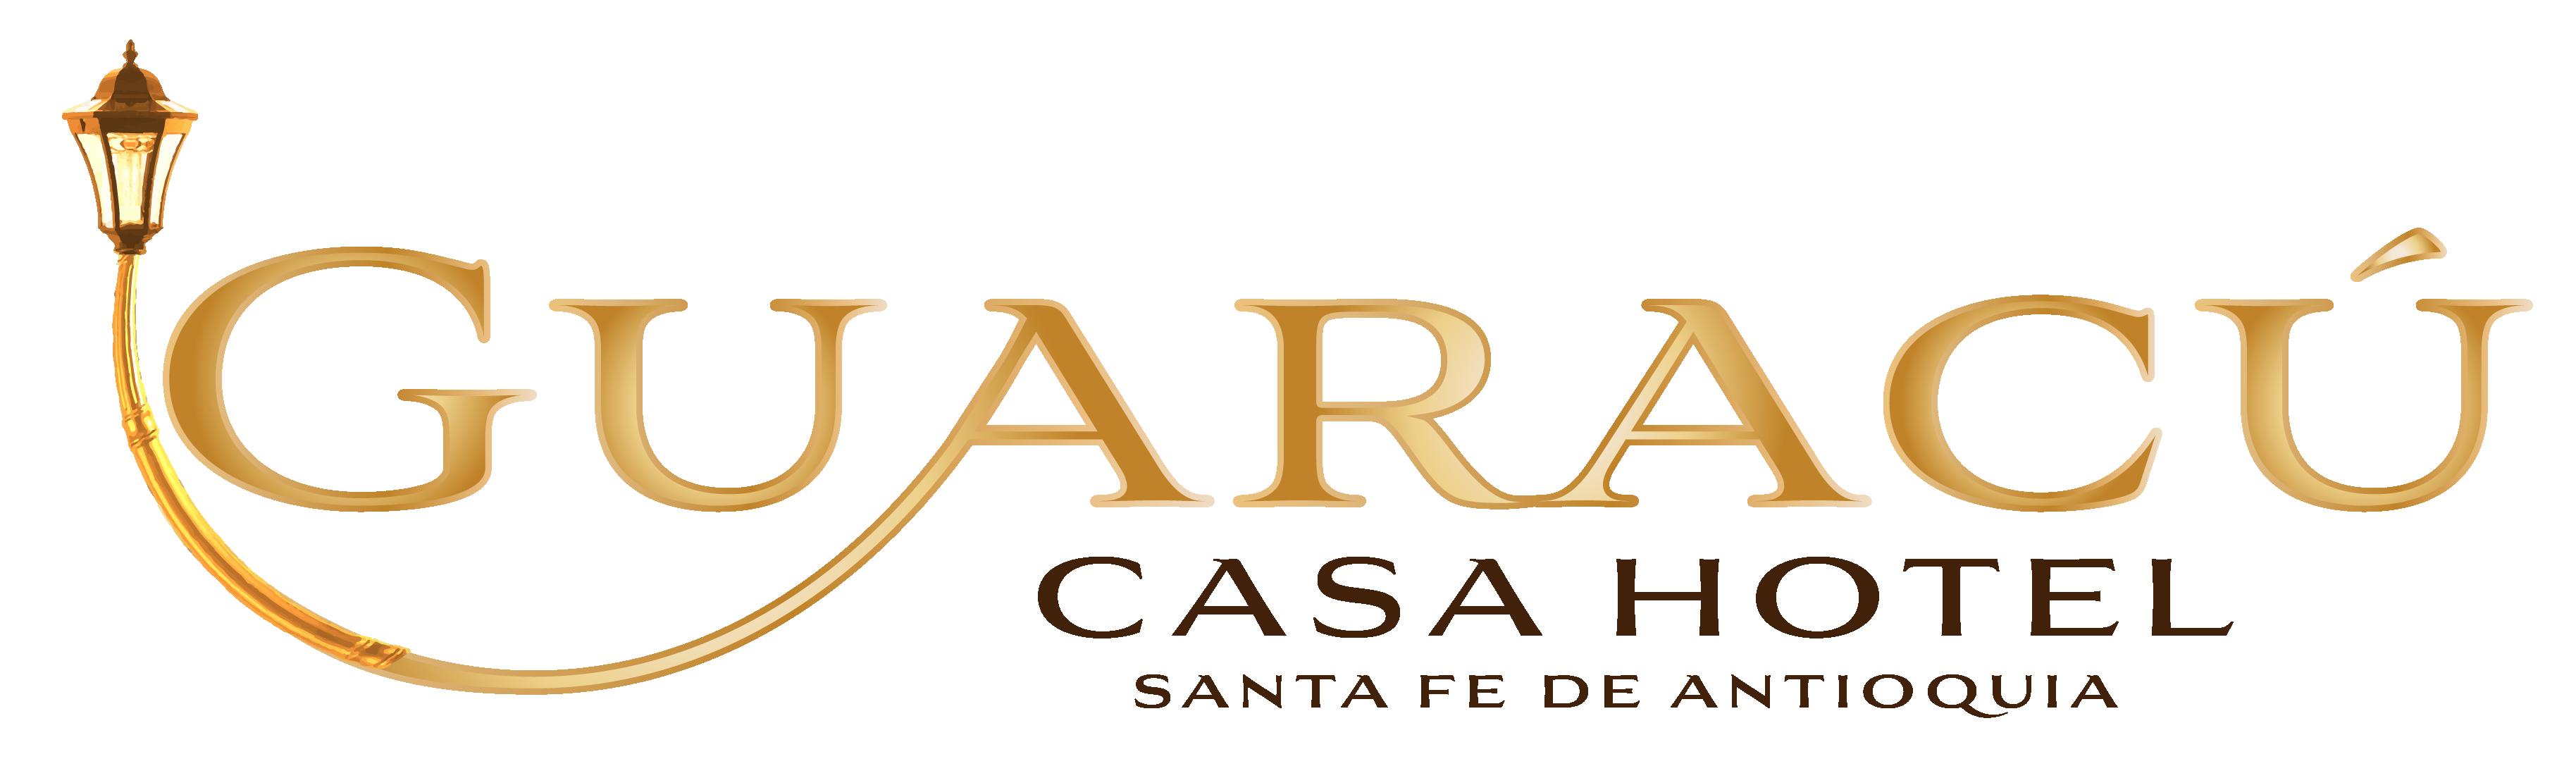 Logo Sin Fondo.jpeg.png